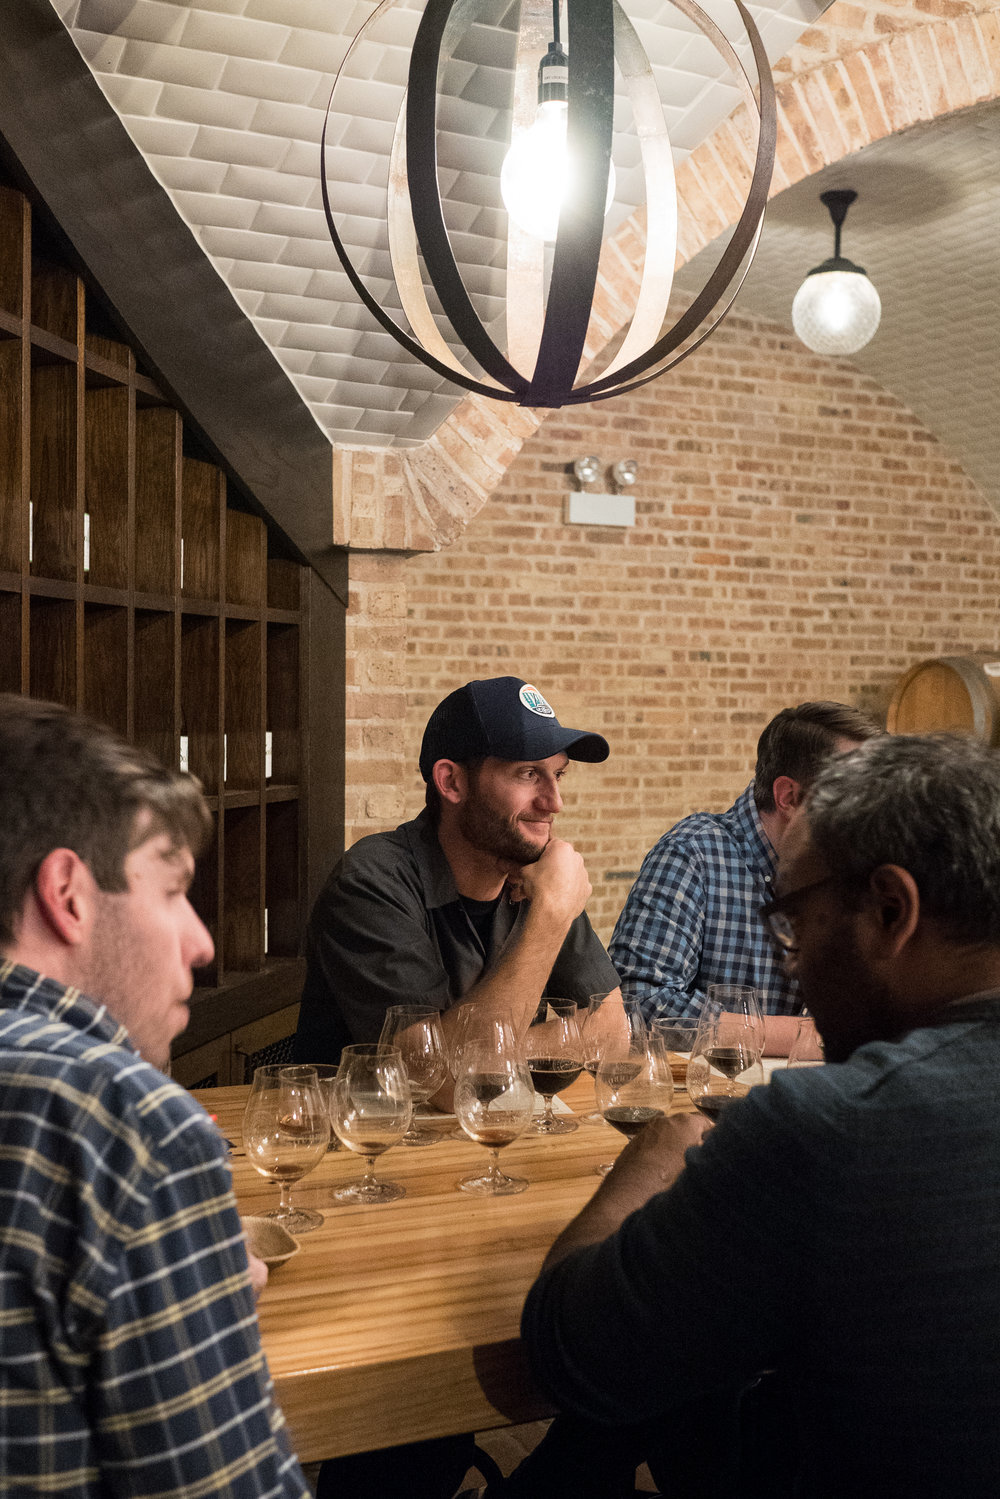 Goose Island brewer, Quinn Fuechsl, contemplates his chosen recipe for 2017's Proprietor's BCBS.